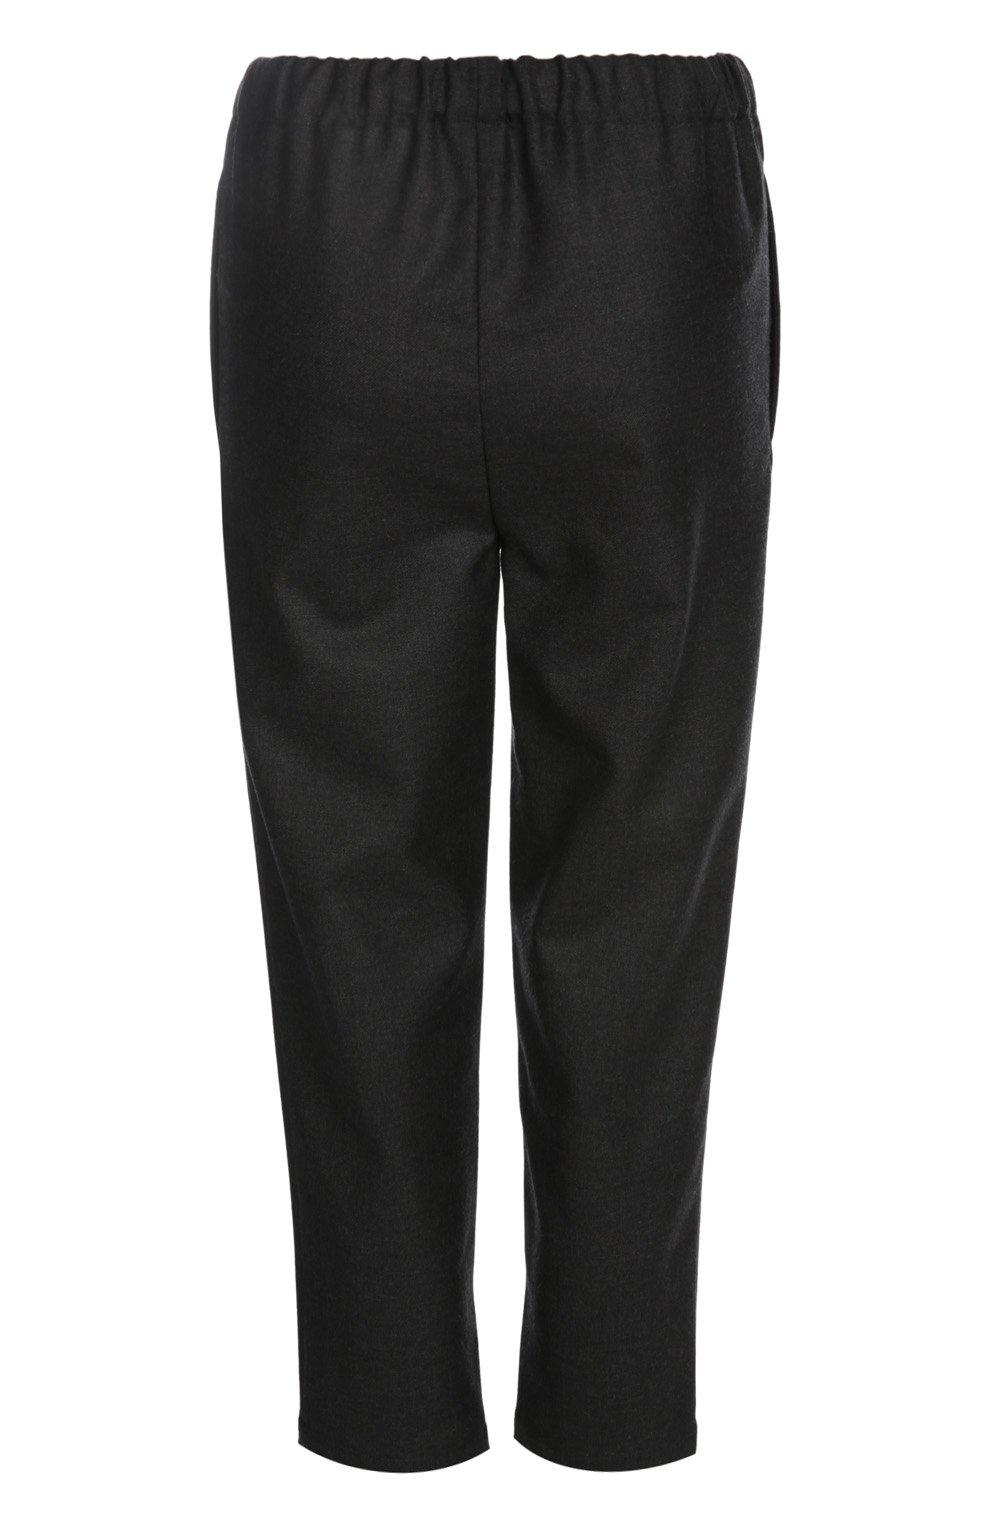 размер брюк s